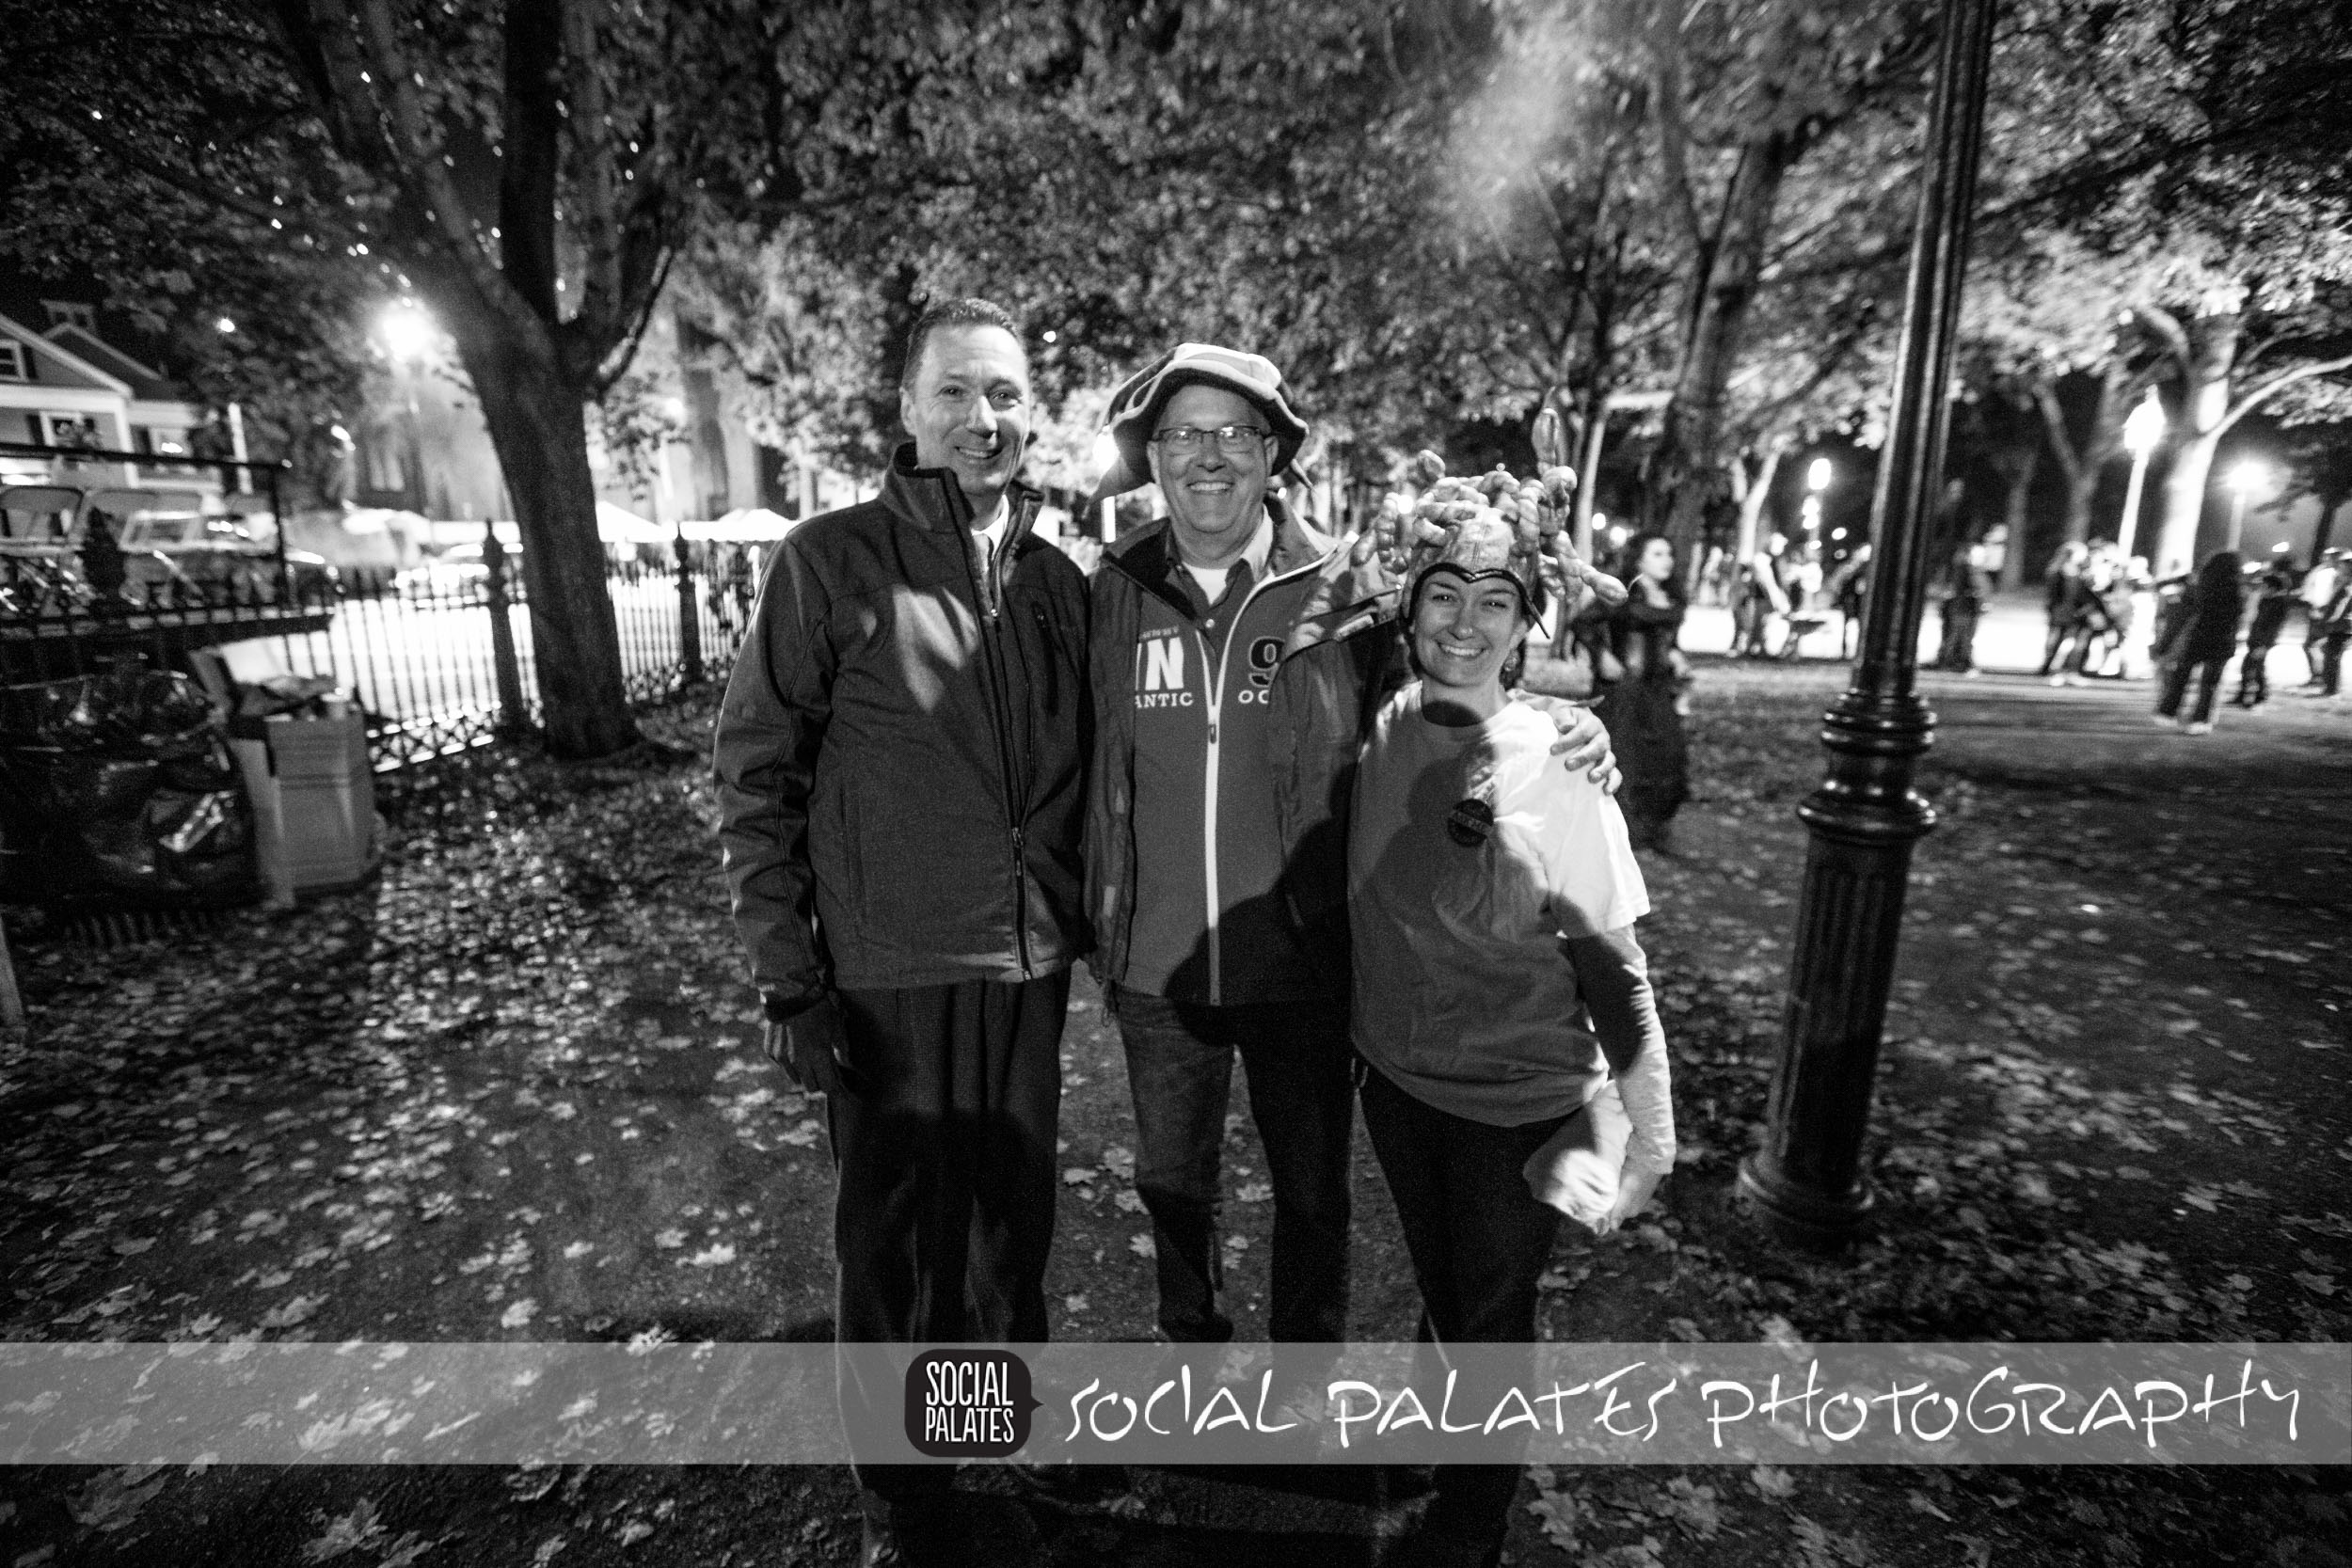 Haunted Happenings Parade 2014 Creative Salem by Social Palates-8007.jpg